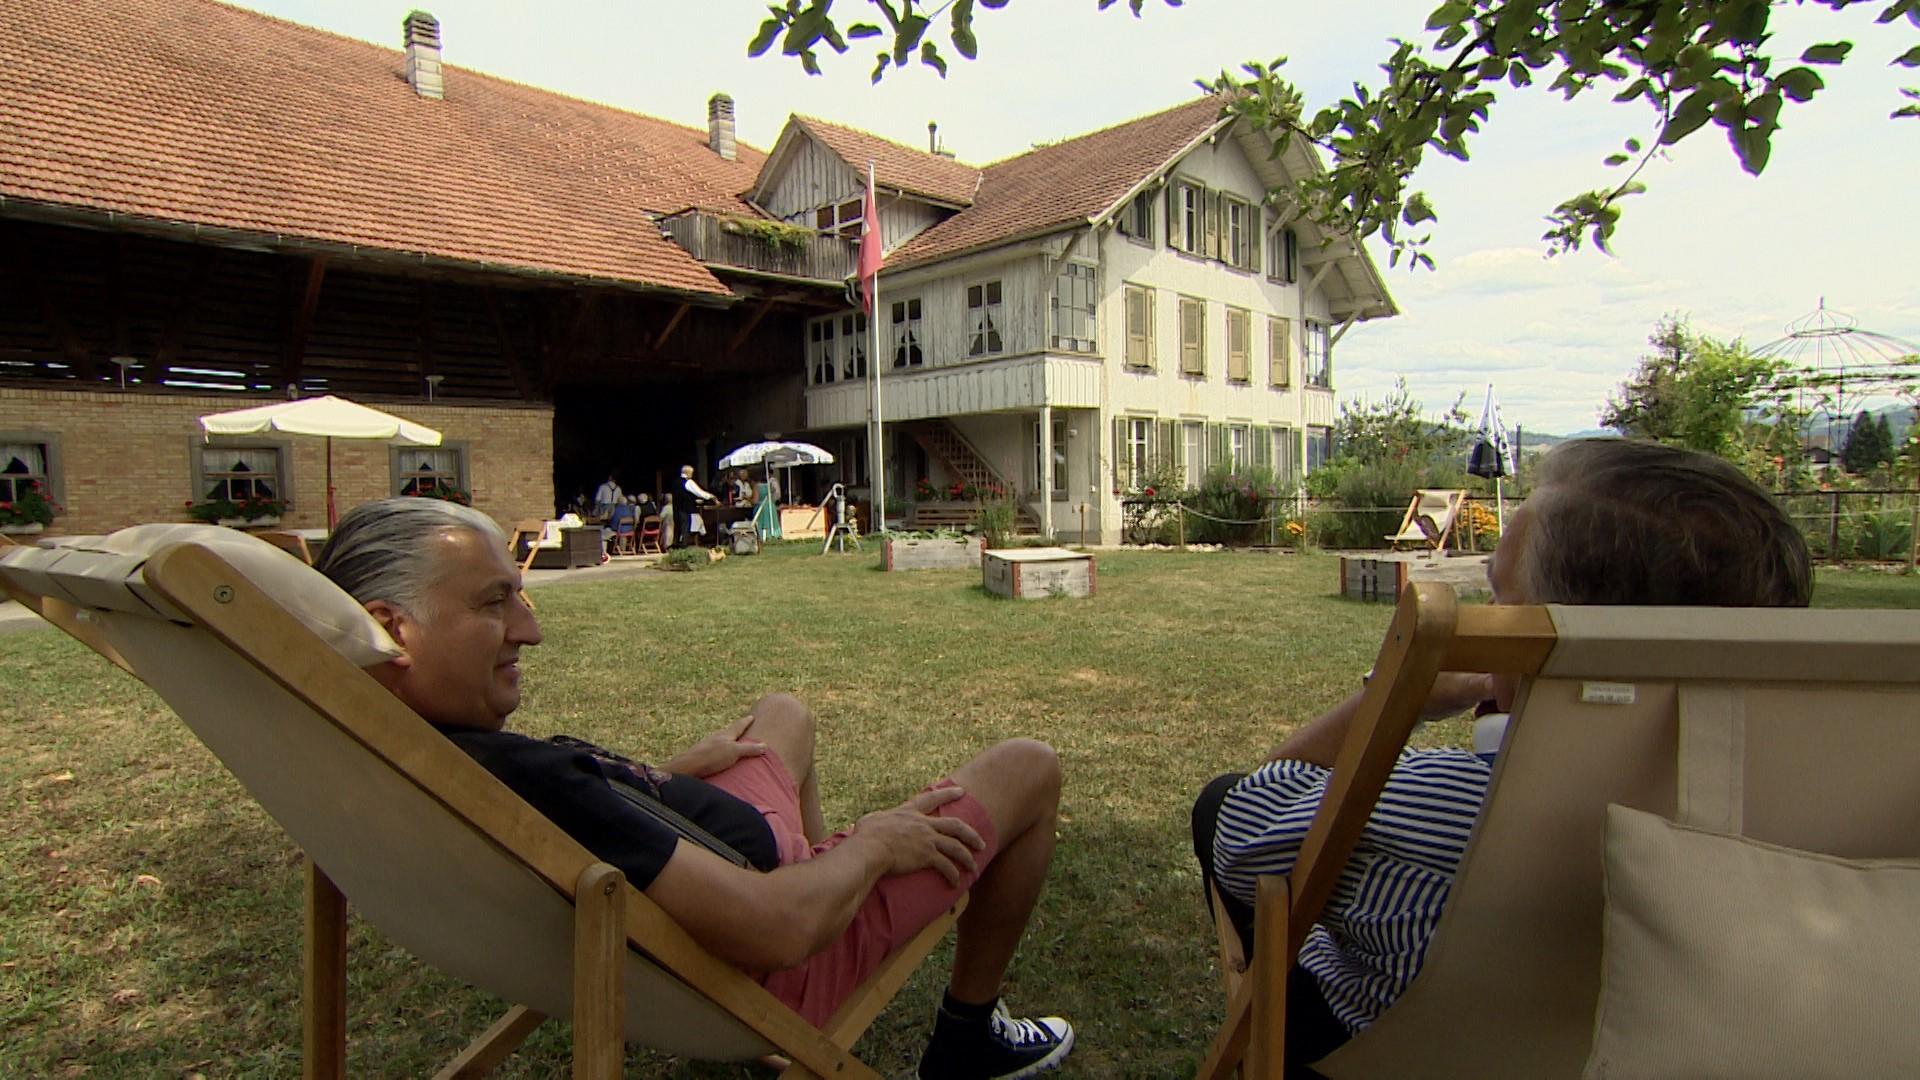 Liegestuhl blick aufs Haus